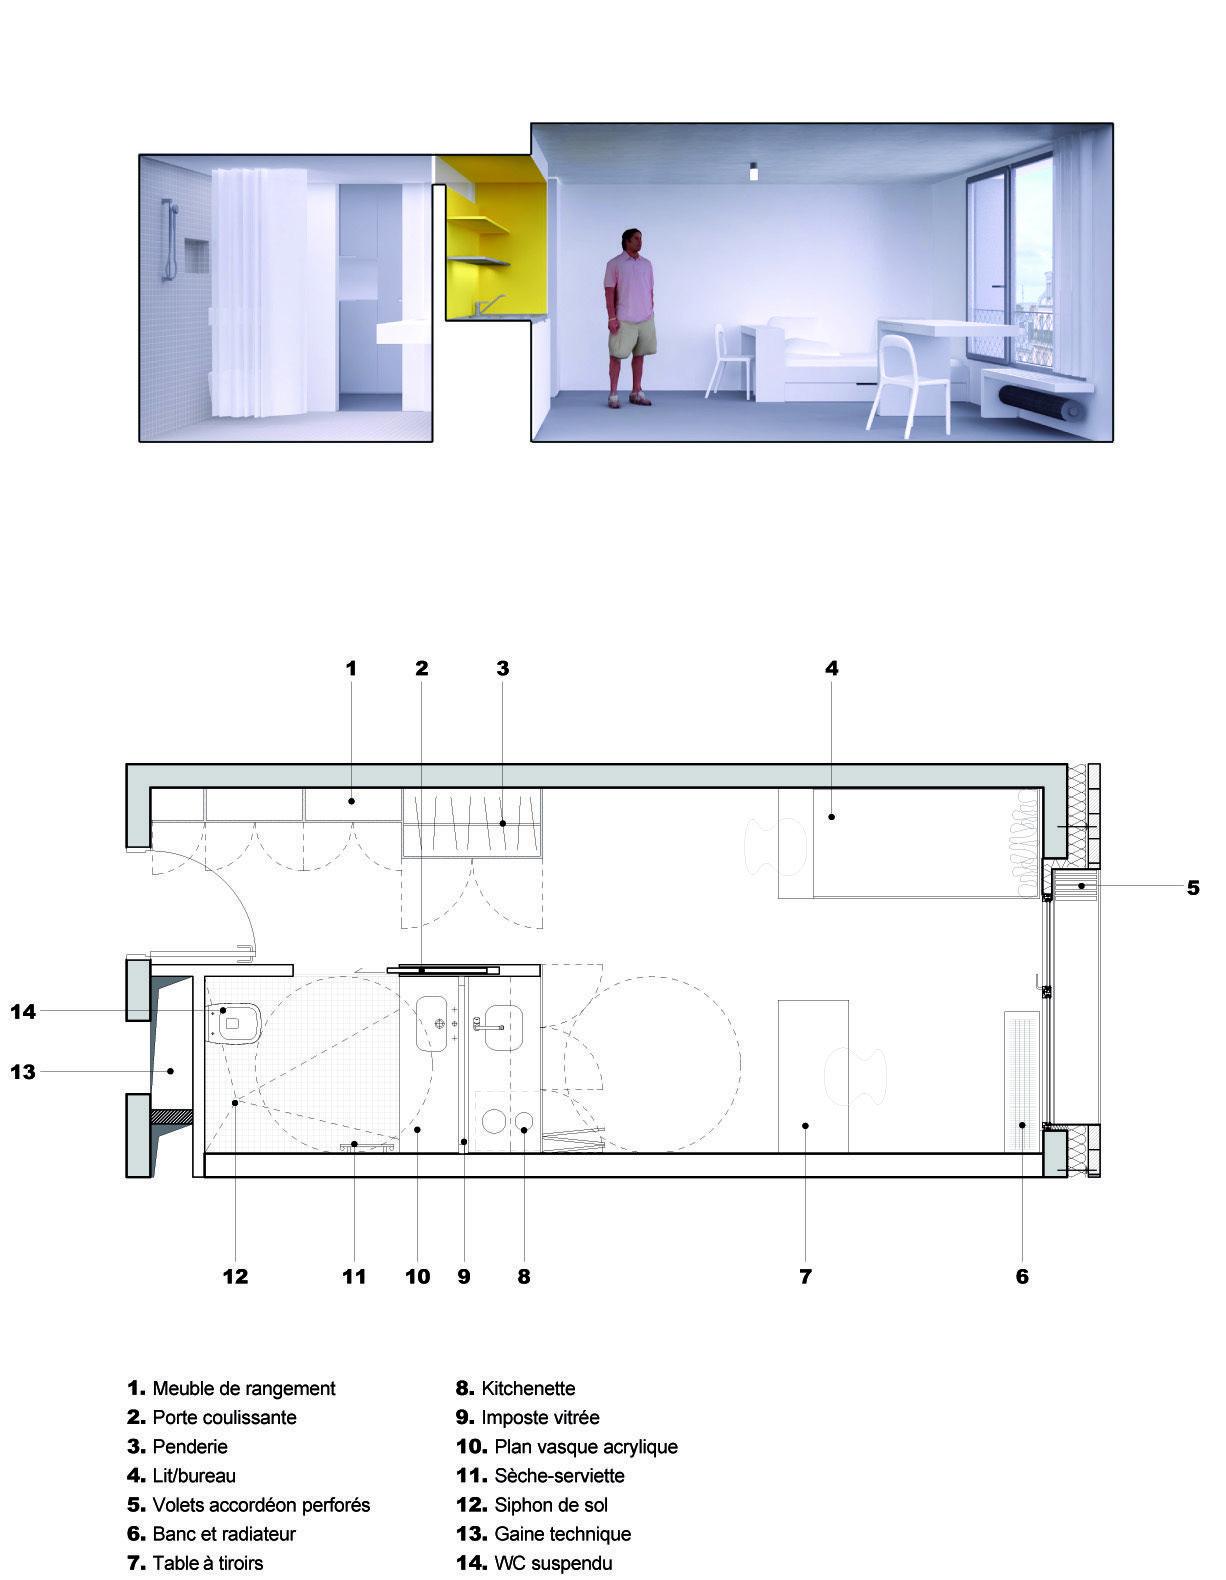 Day-Care And Young Workers Hostel / Chartier Dalix Architectes + Avenier Cornejo Architectes